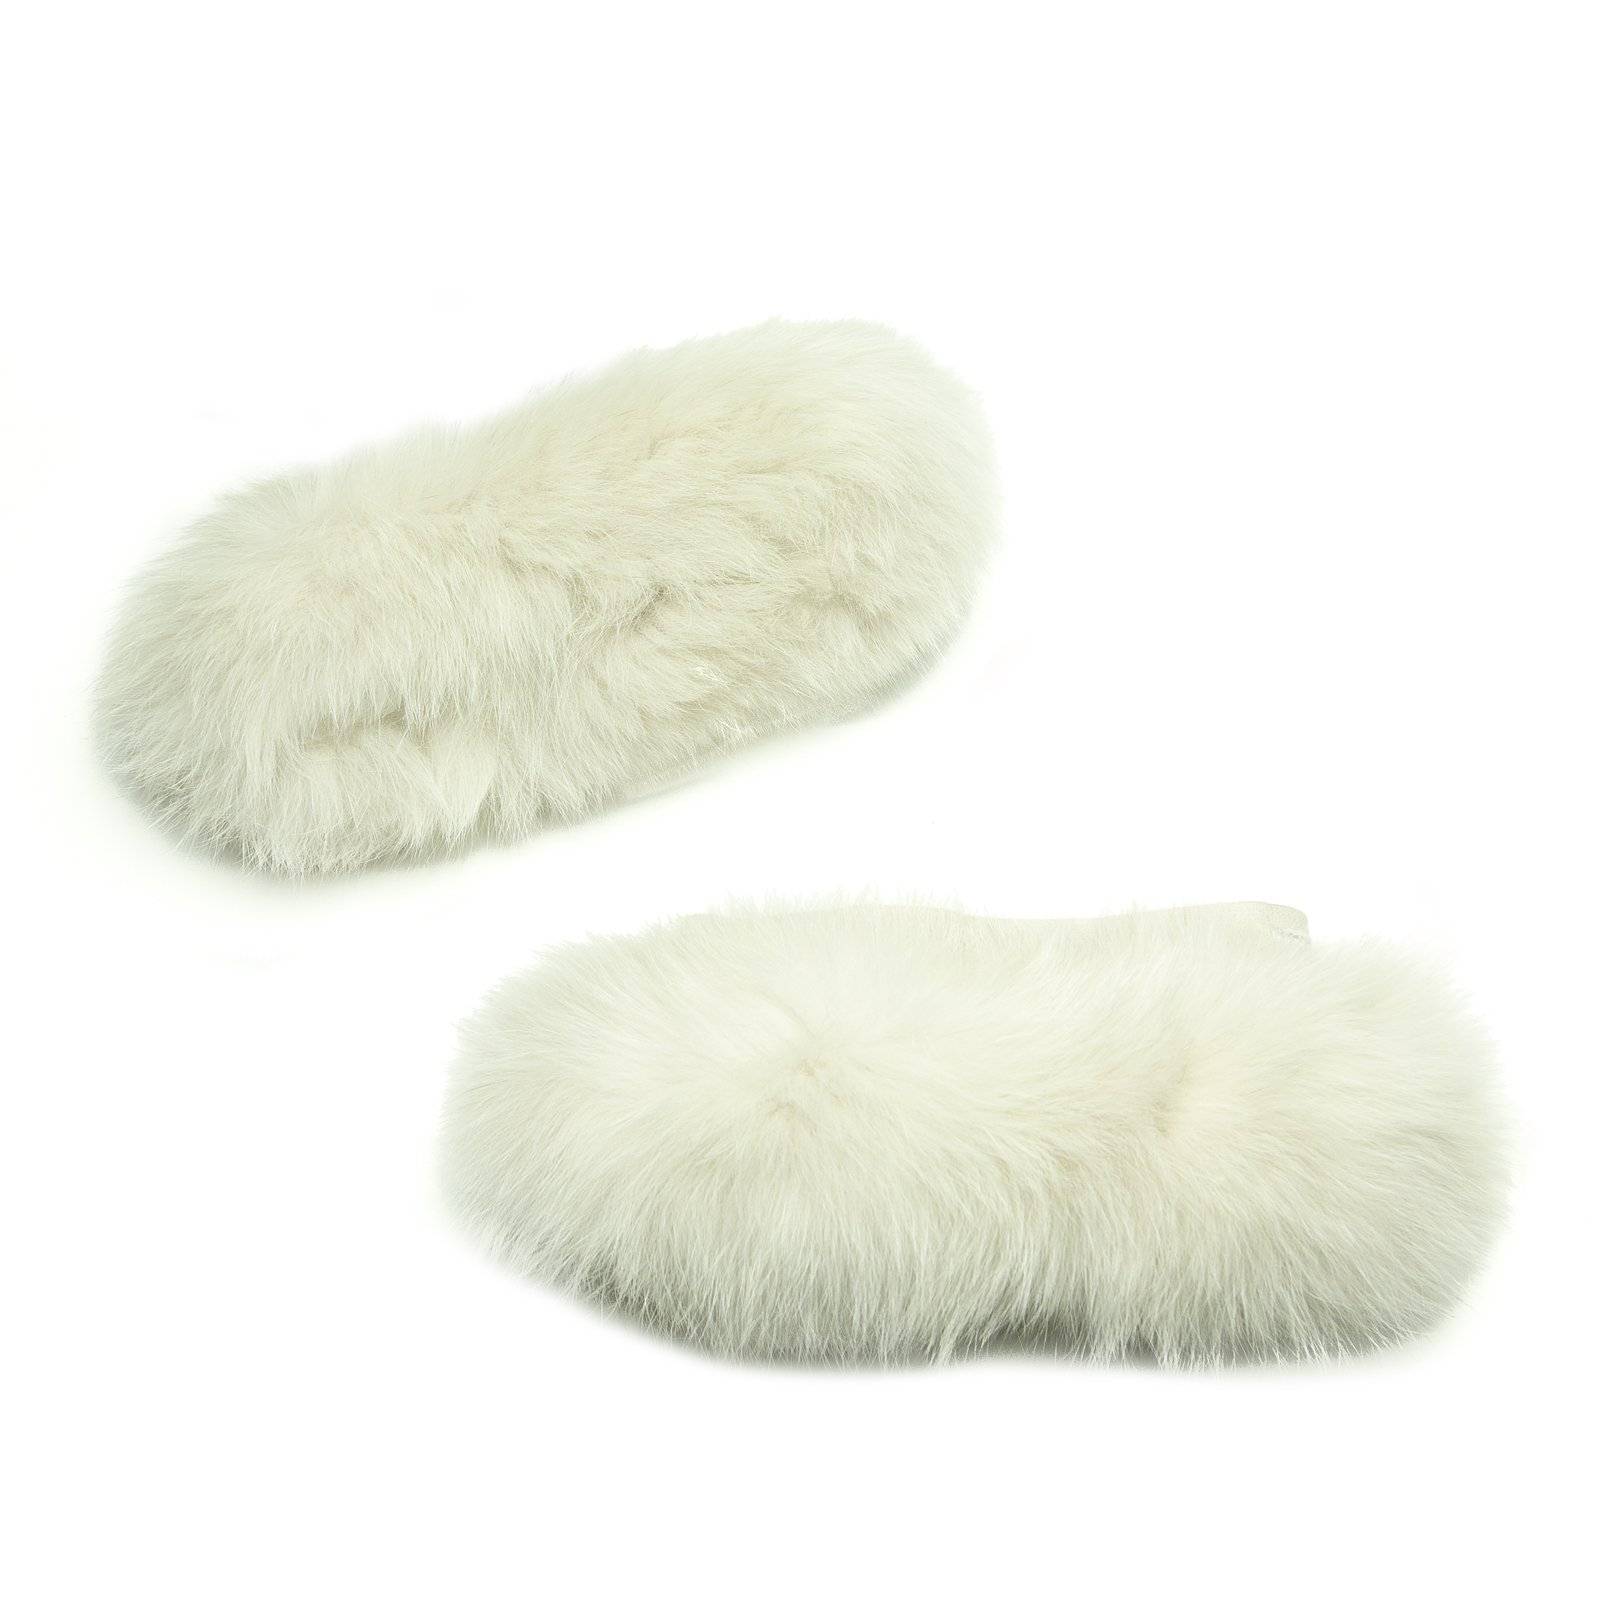 'S Max Mara Women's Pechino Fox Fur Cube Collection Cuffs One Size Ice